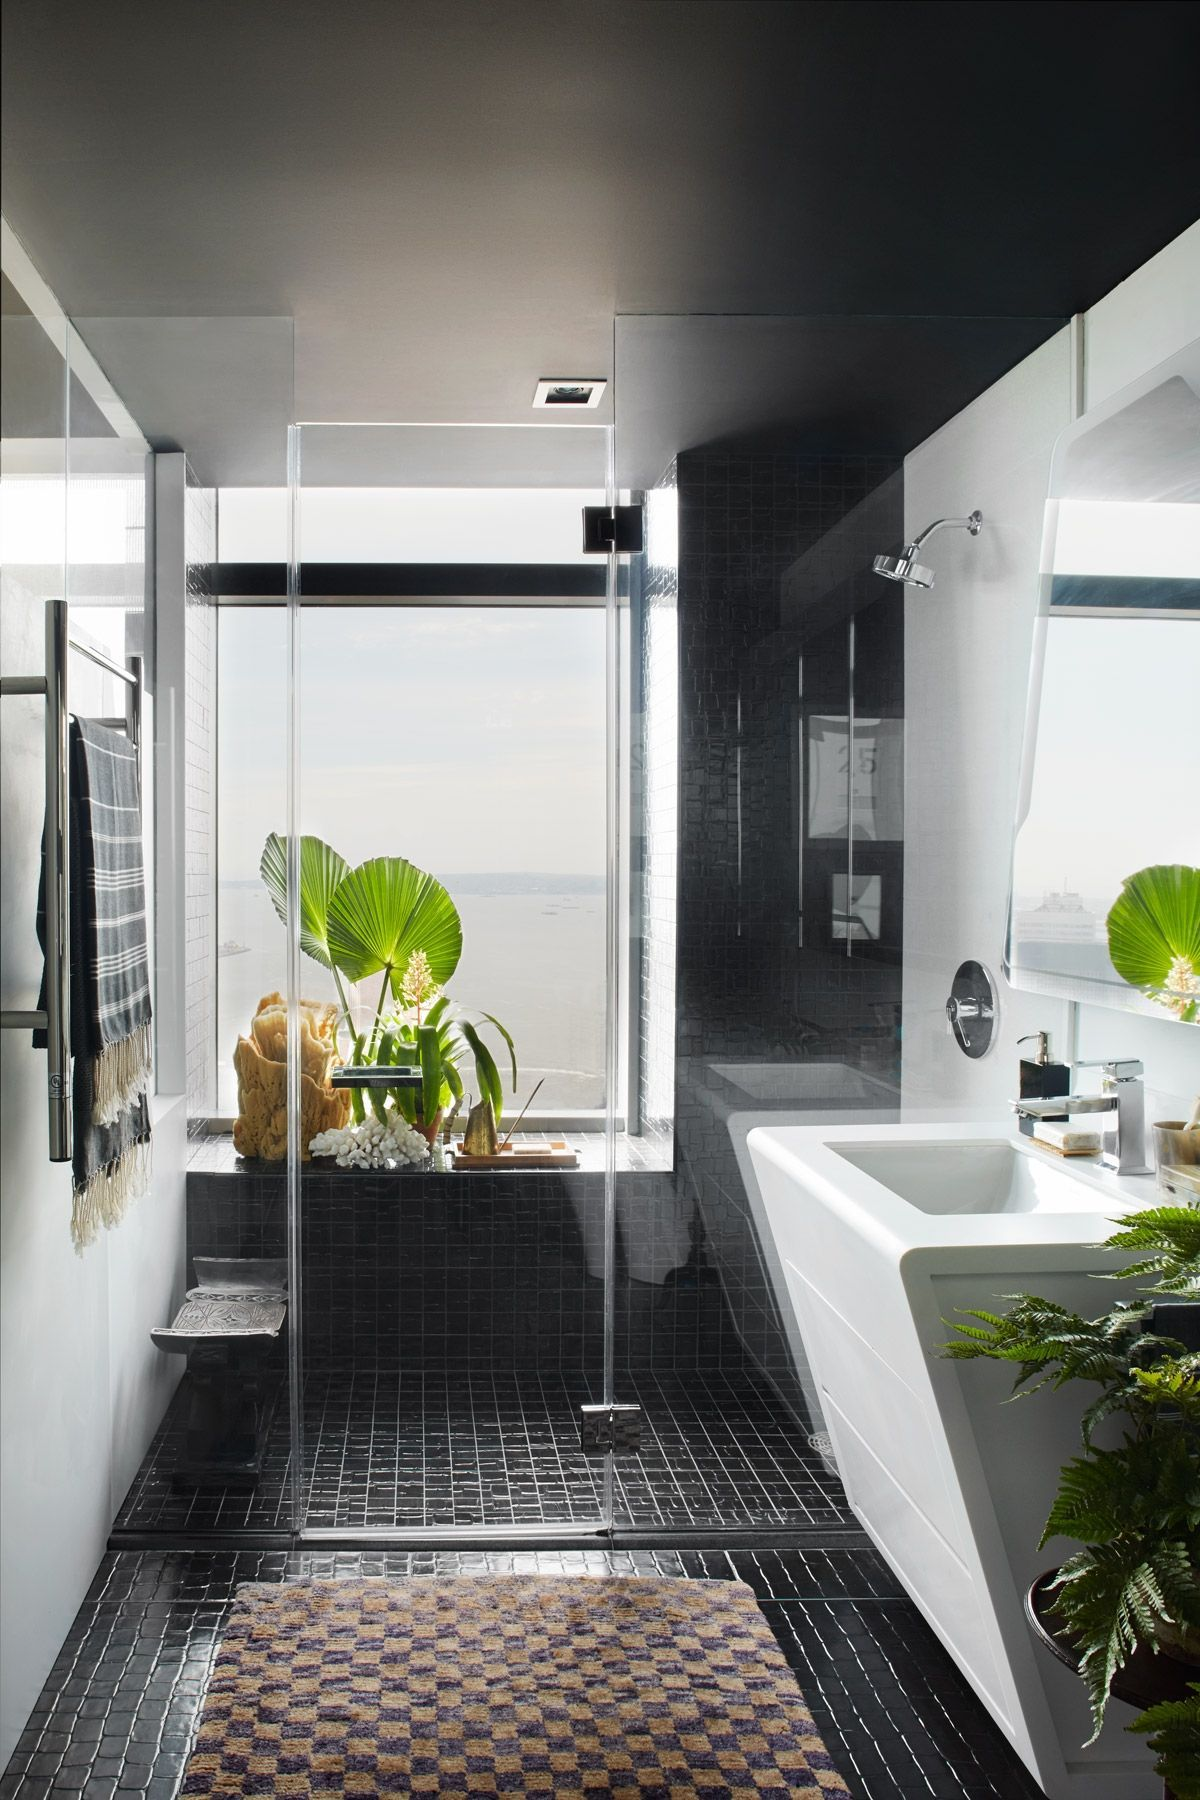 http://www.elledecor.com/design-decorate/interior-designers/g2425/stylish-bathroom-ideas/?src=socialflowFB